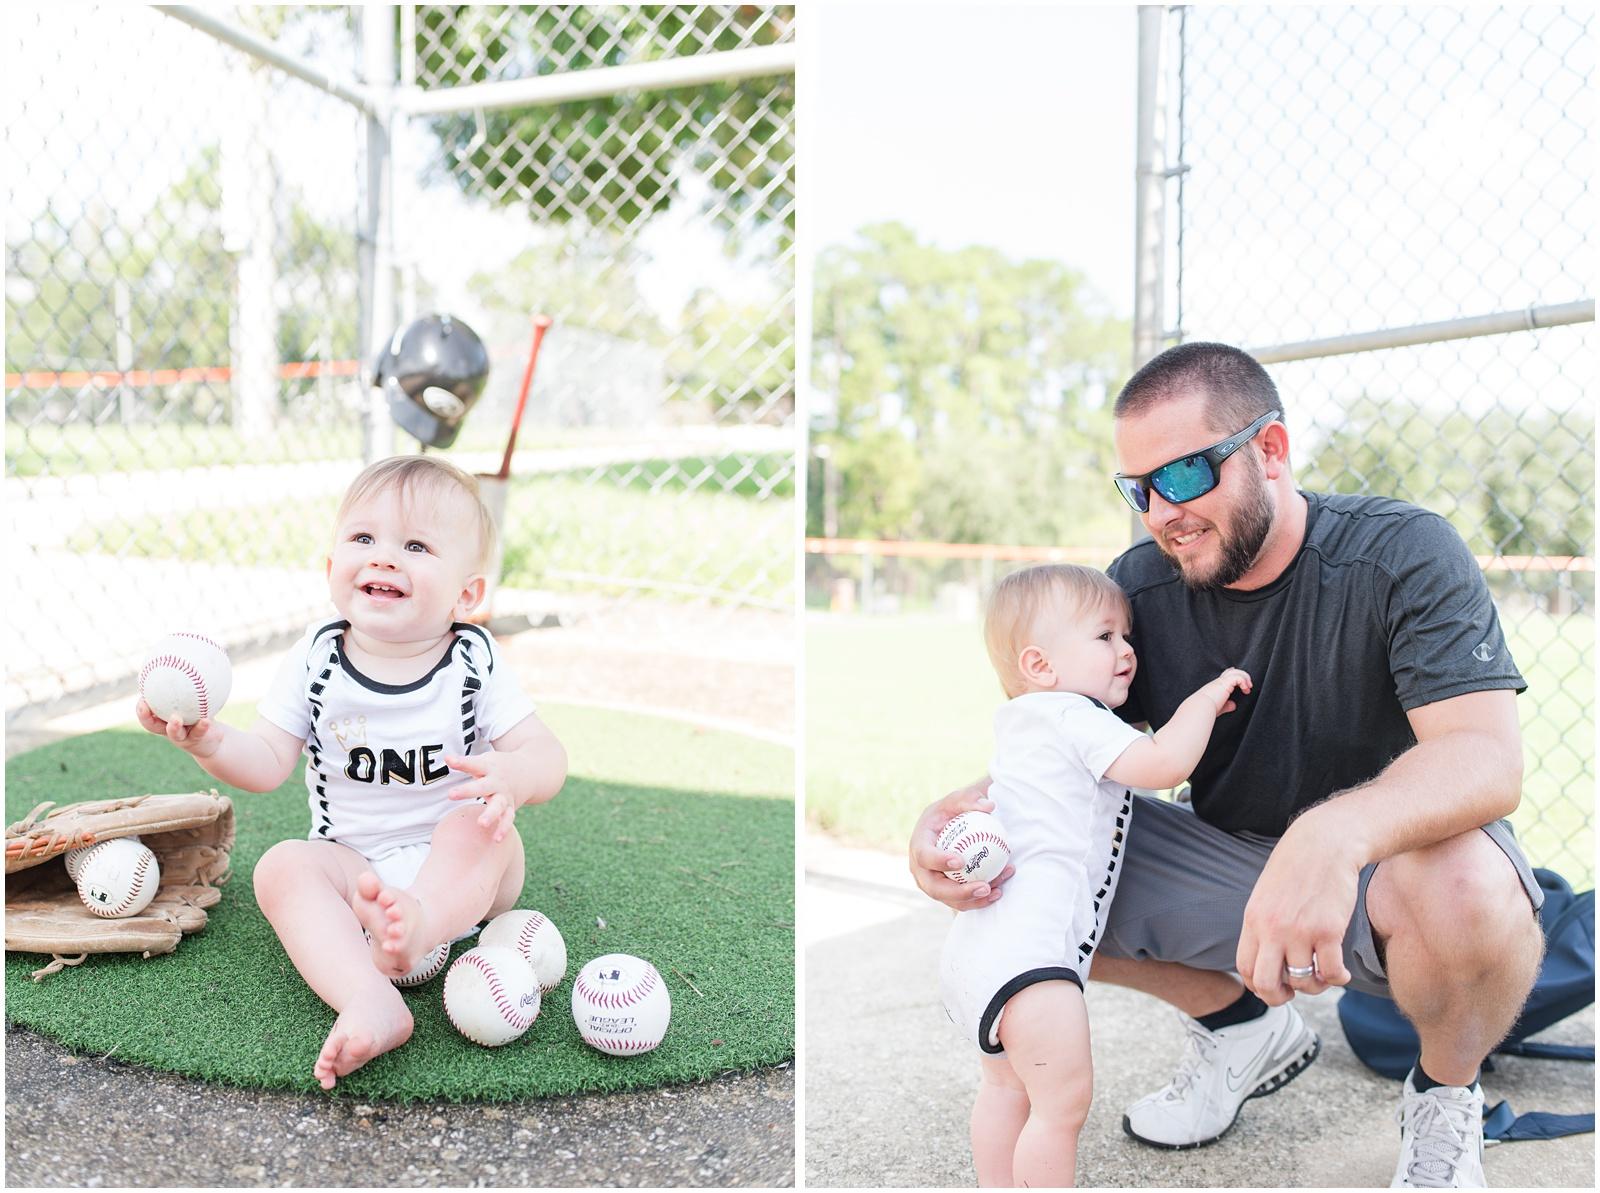 One Year_Baby_Portraits_Baseball_Field_10.jpg